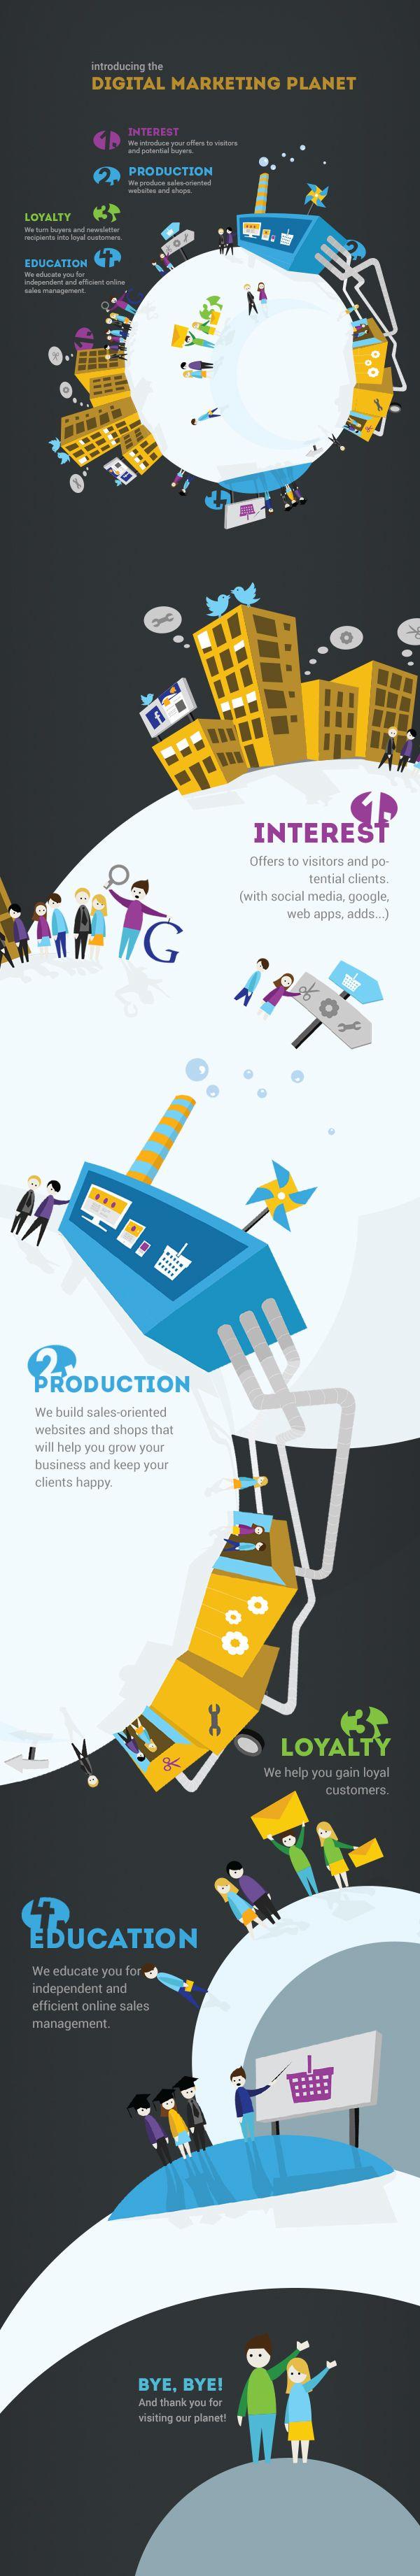 Digital marketing - illustration by Tjaša Majdič, via Behance